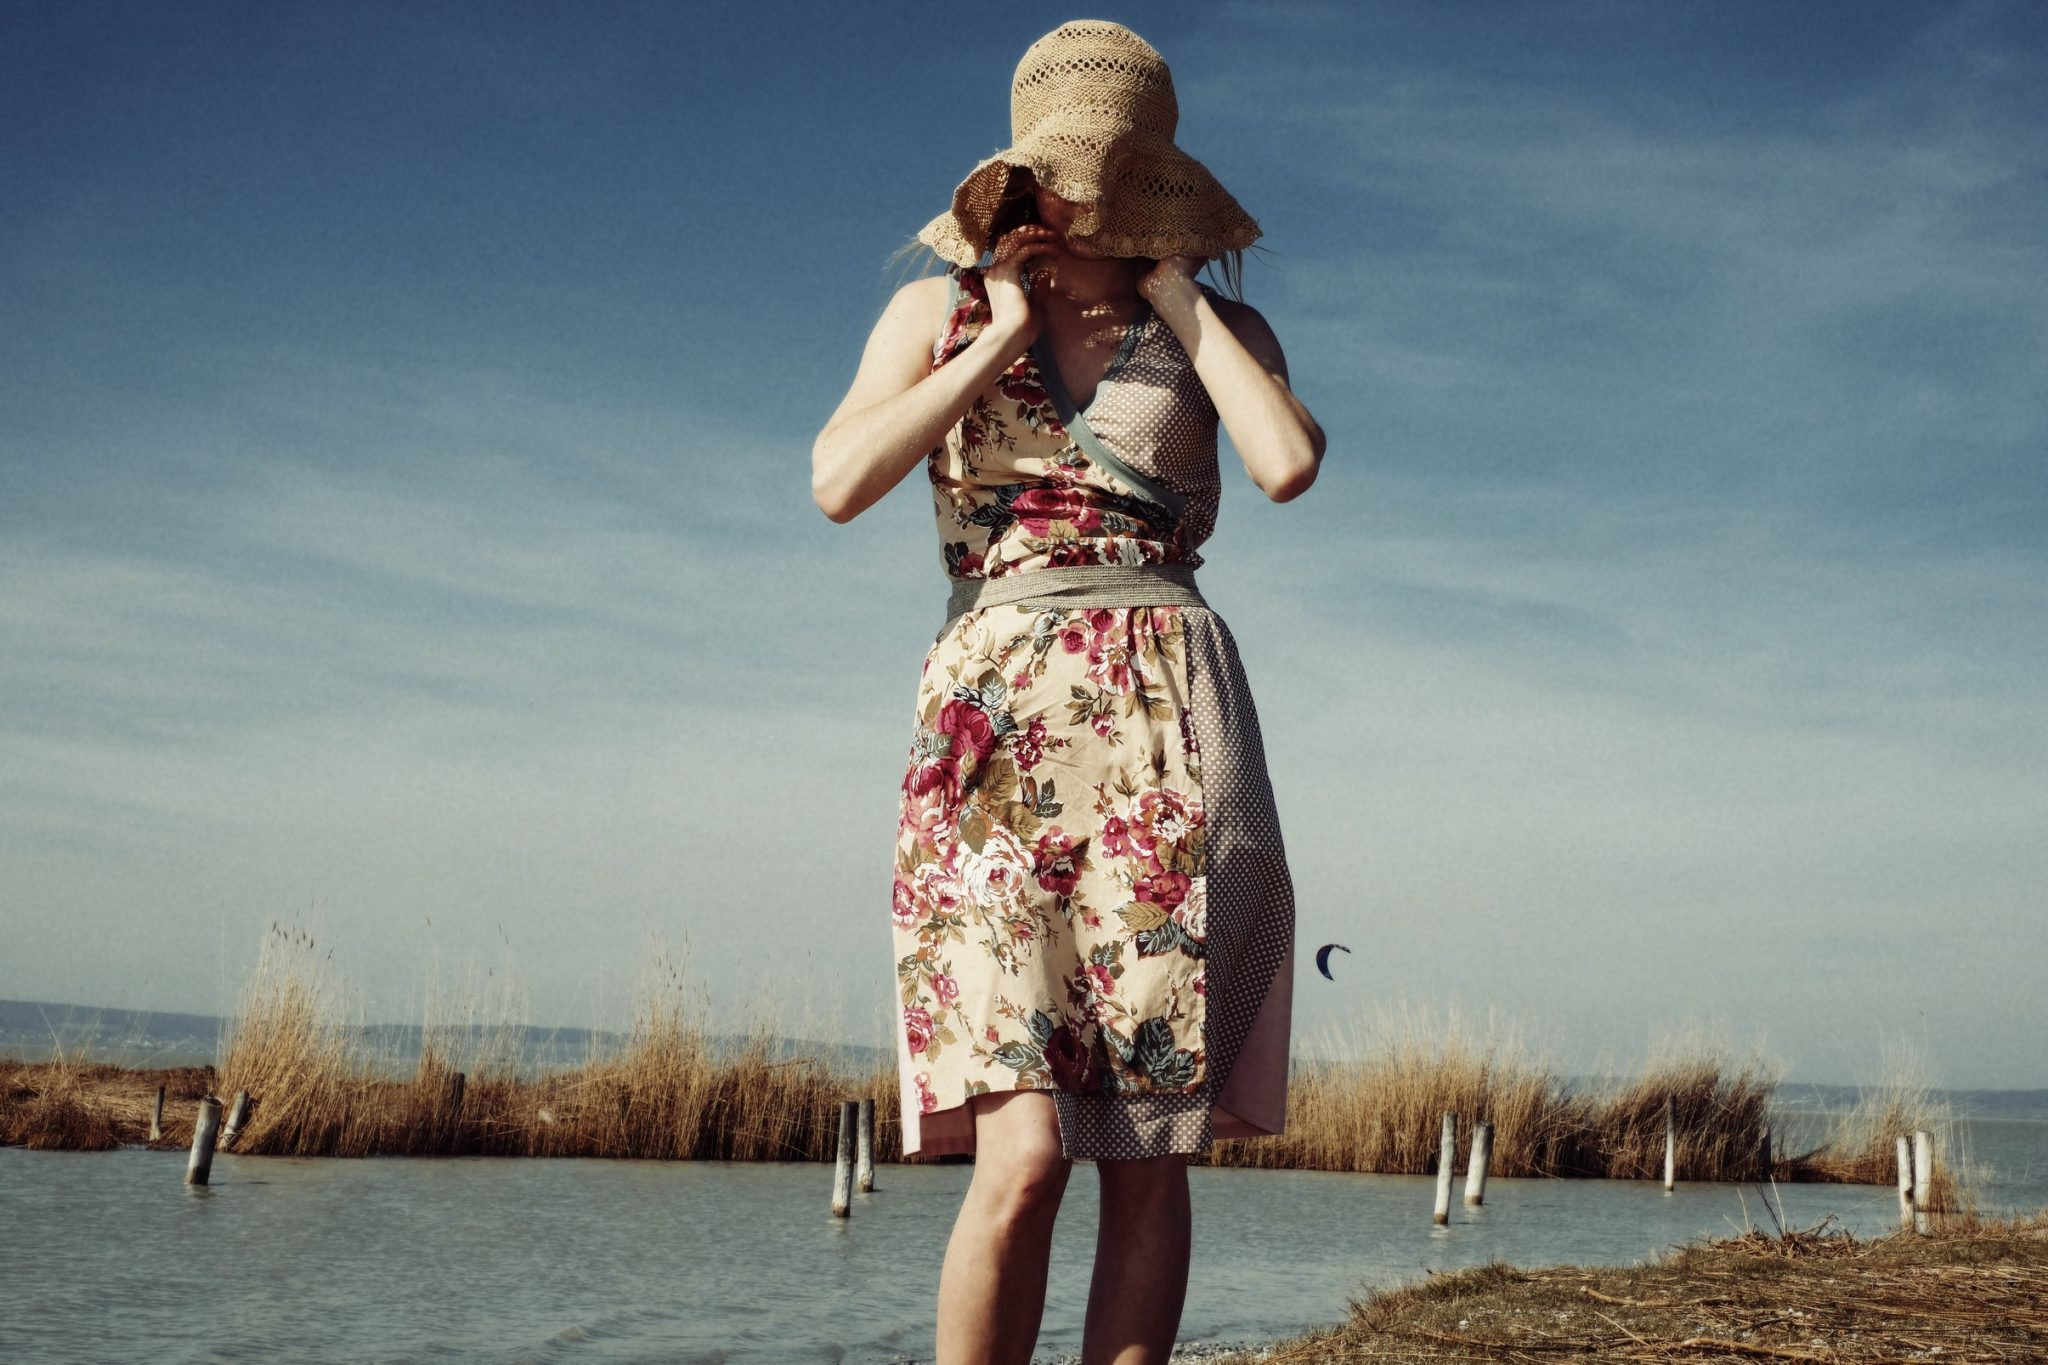 Wienerkleid Spring 19 by Steve Haider (43)_resize